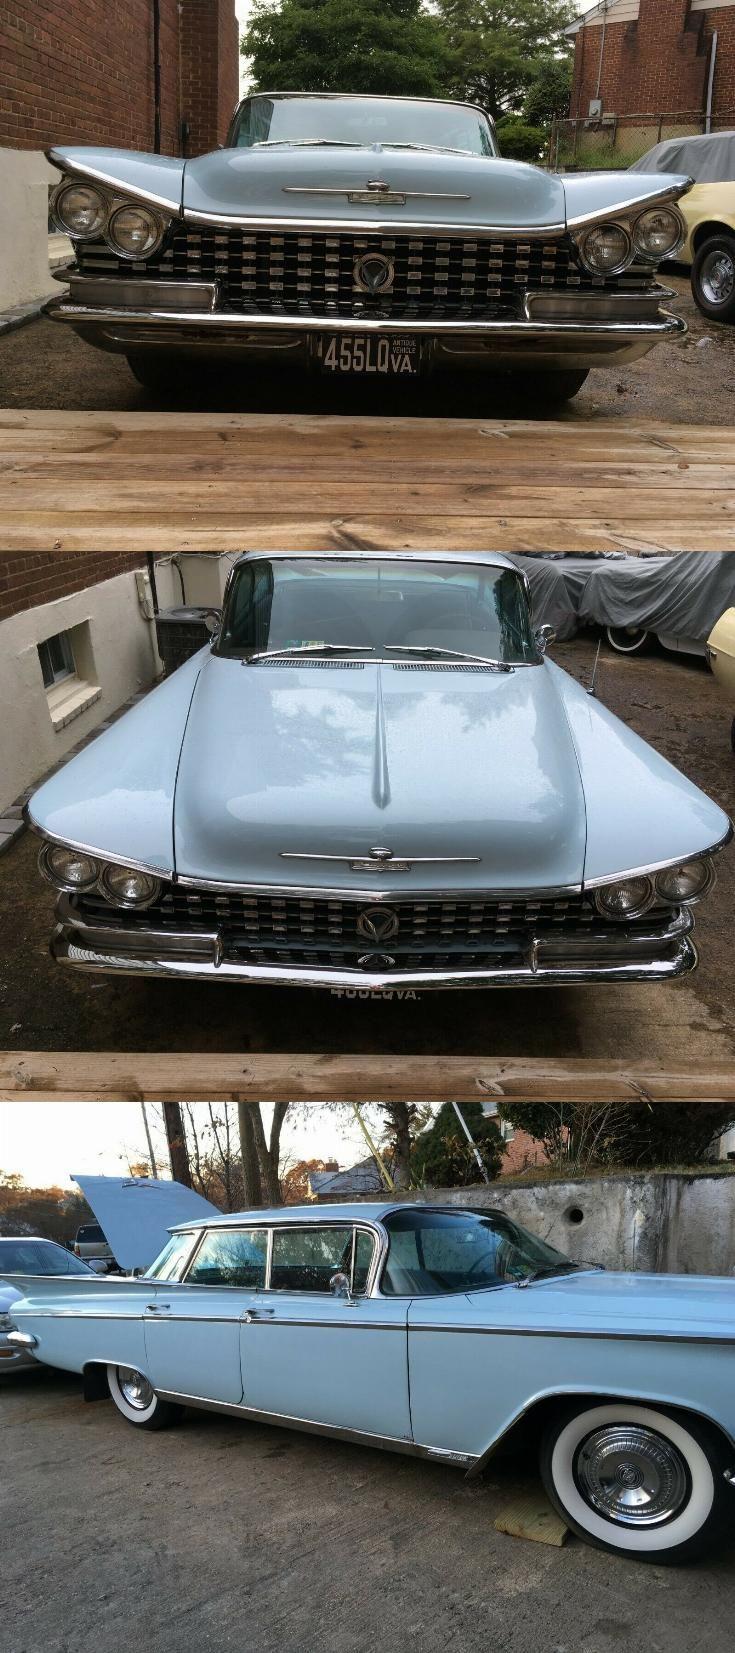 2020 Buick Electra Exterior